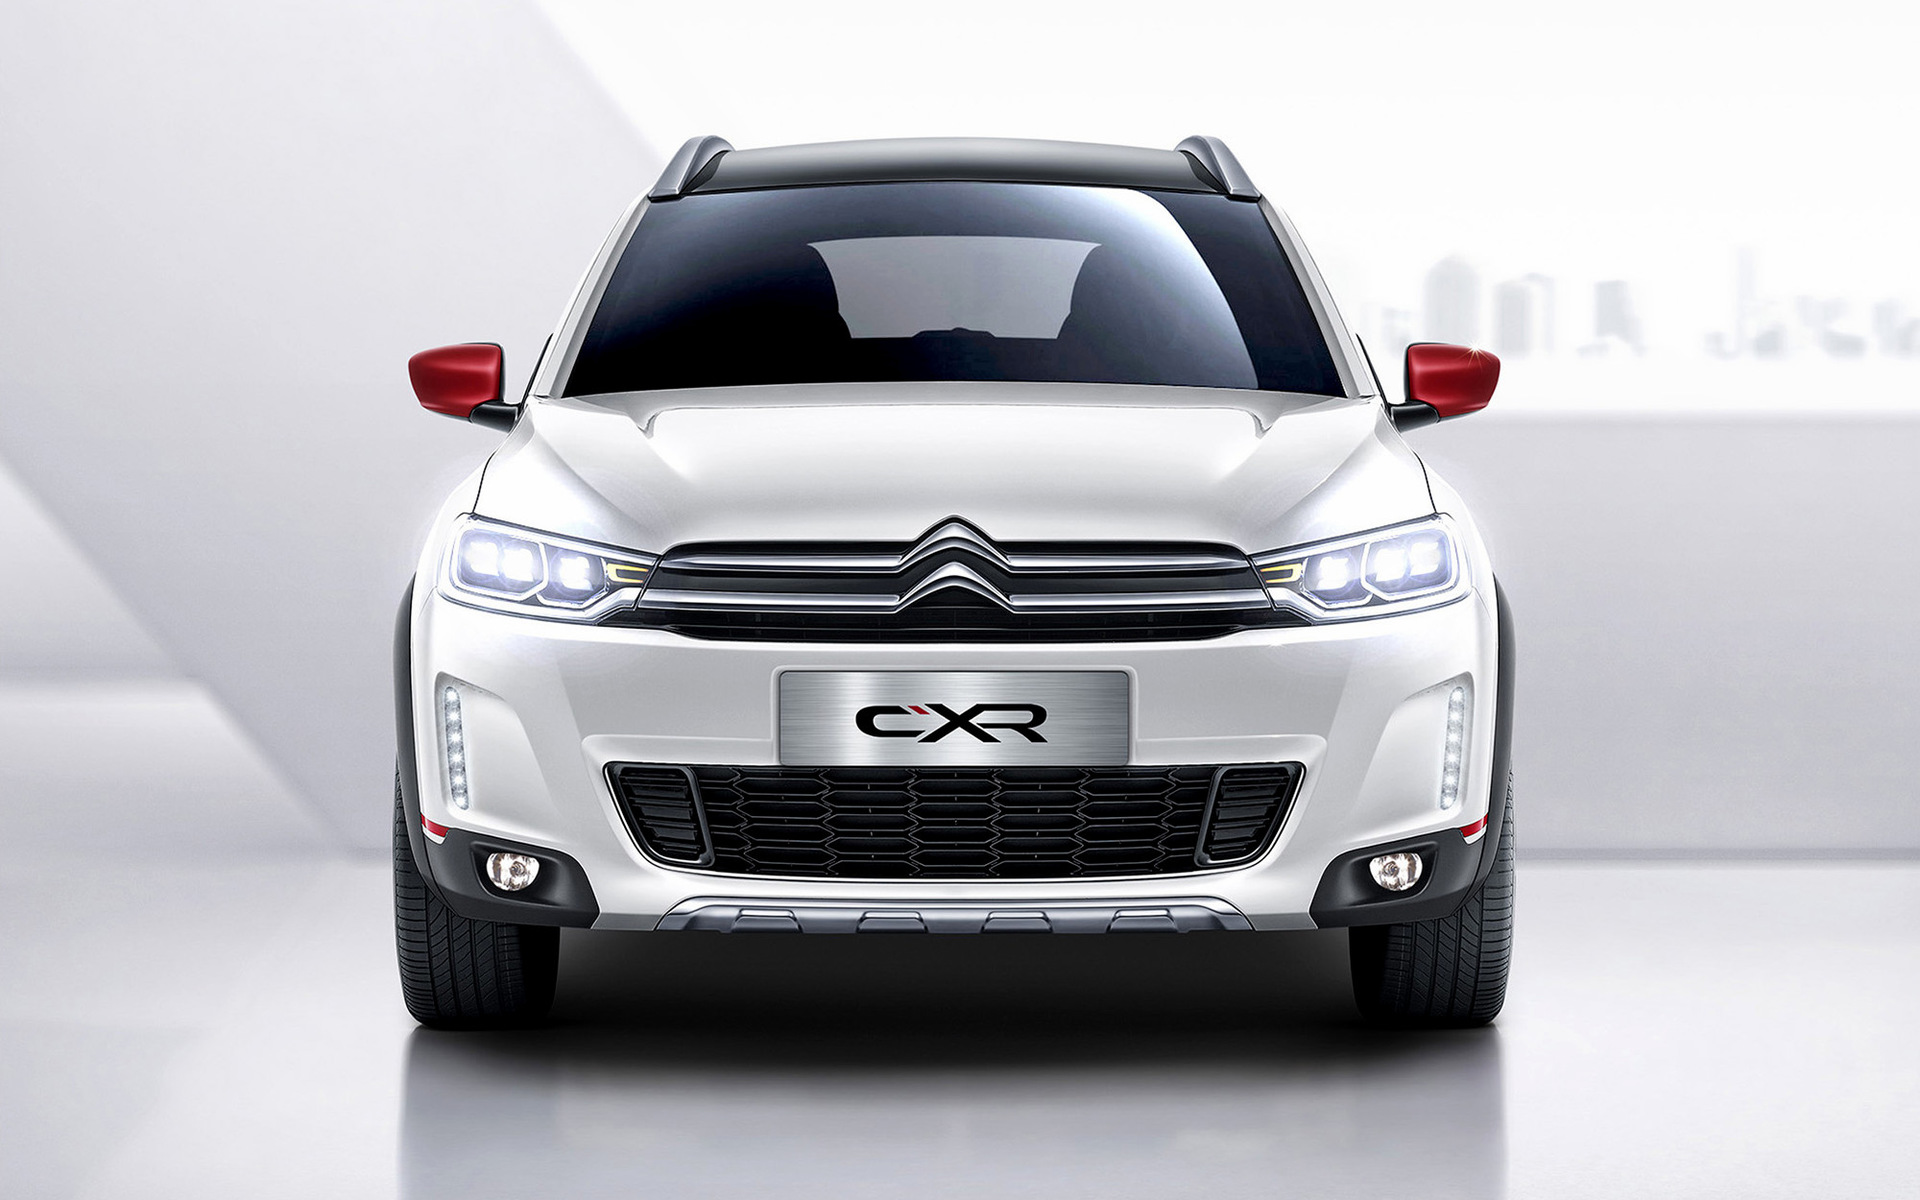 Citroen C Xr Concept 2014 Wallpapers And Hd Images Car